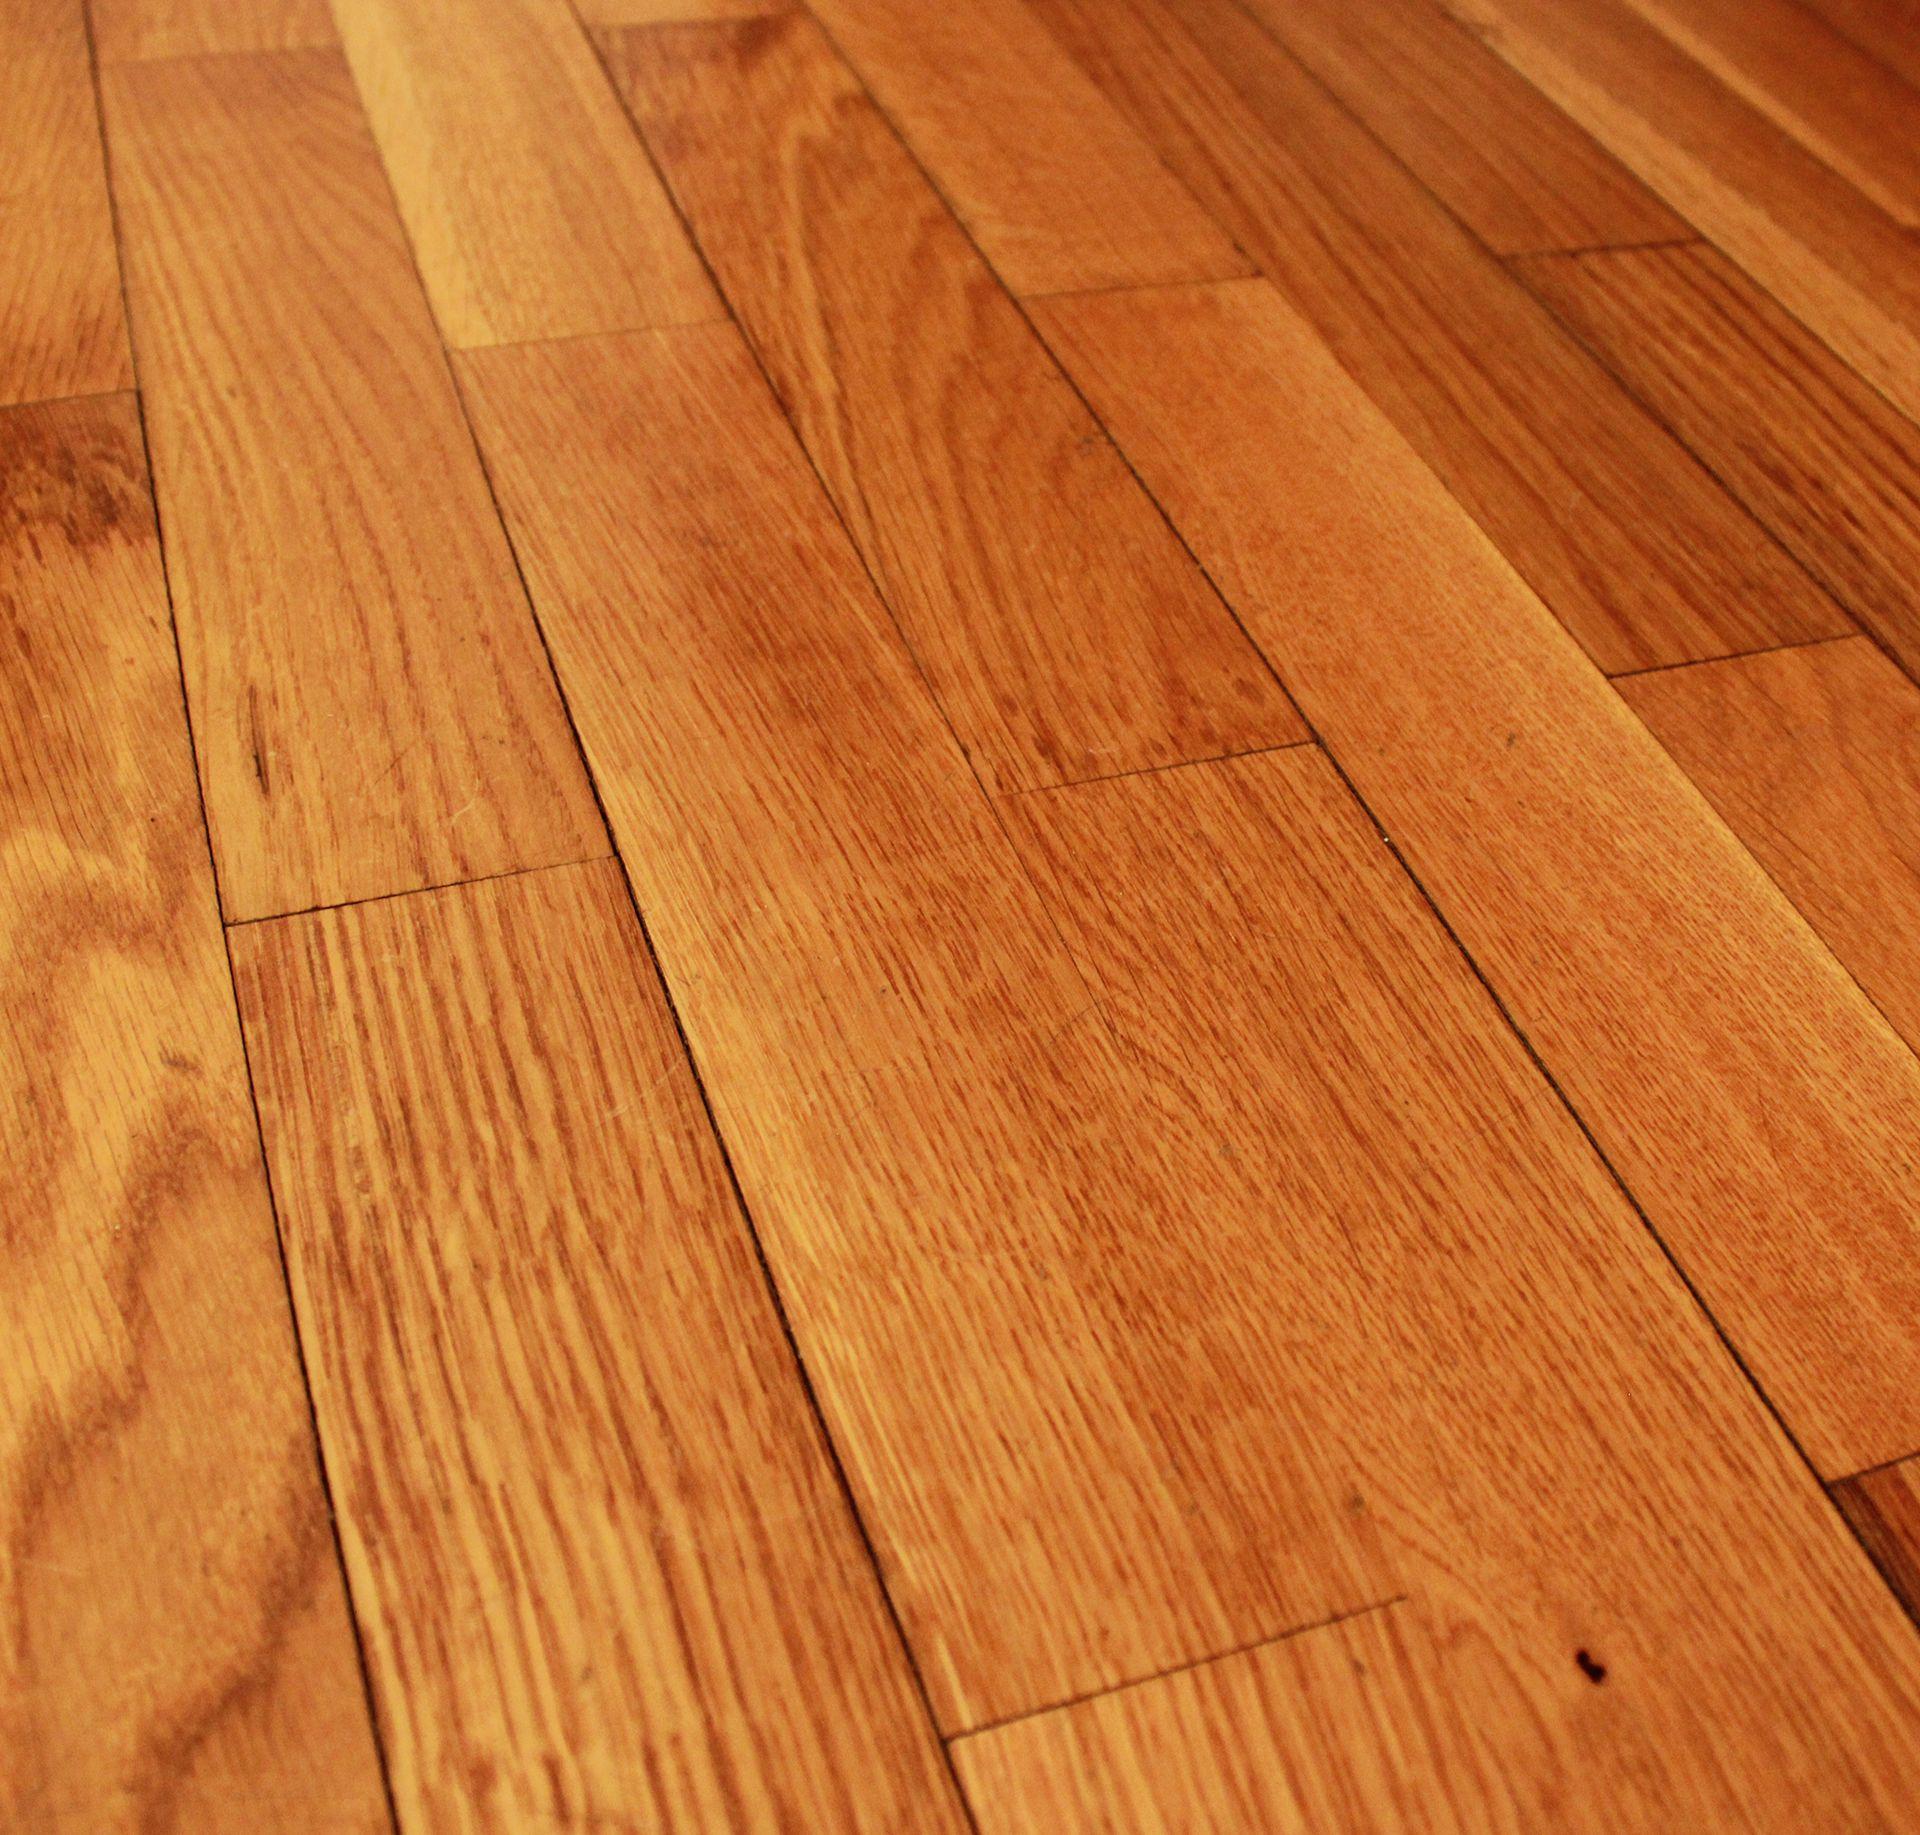 https://lvflooring.ca/wp-content/uploads/2020/06/Red-Oak-Hardwood-Floor-right.jpg